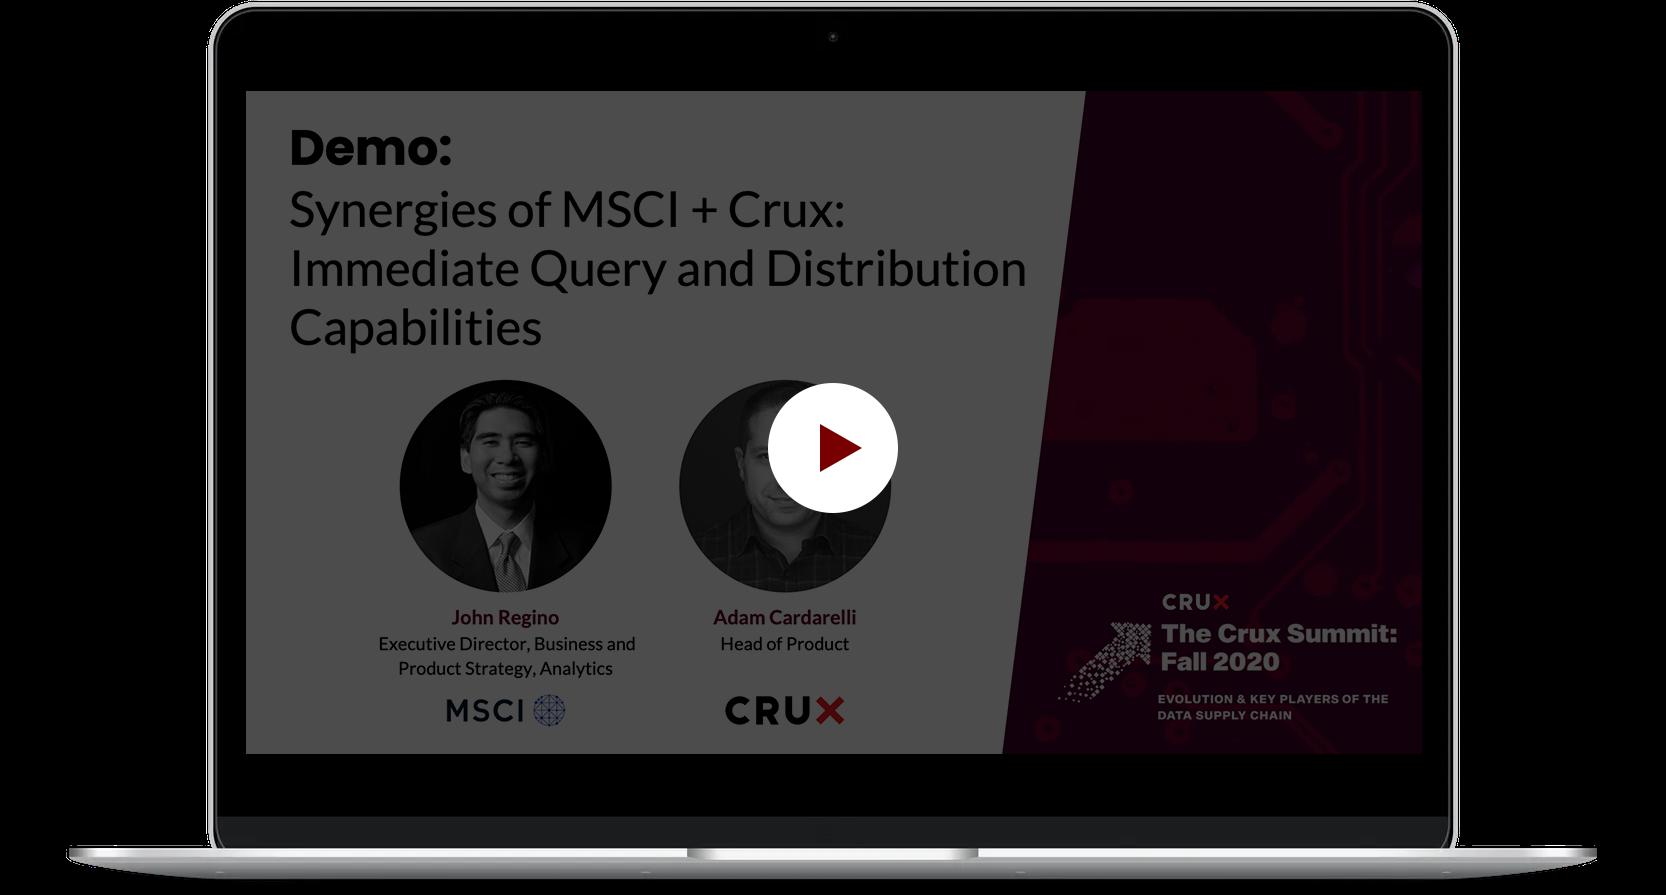 Crux_TCS_Demo+SynergiesMSCI_Crux+ImmediateQueryDistributionCapabilities_03